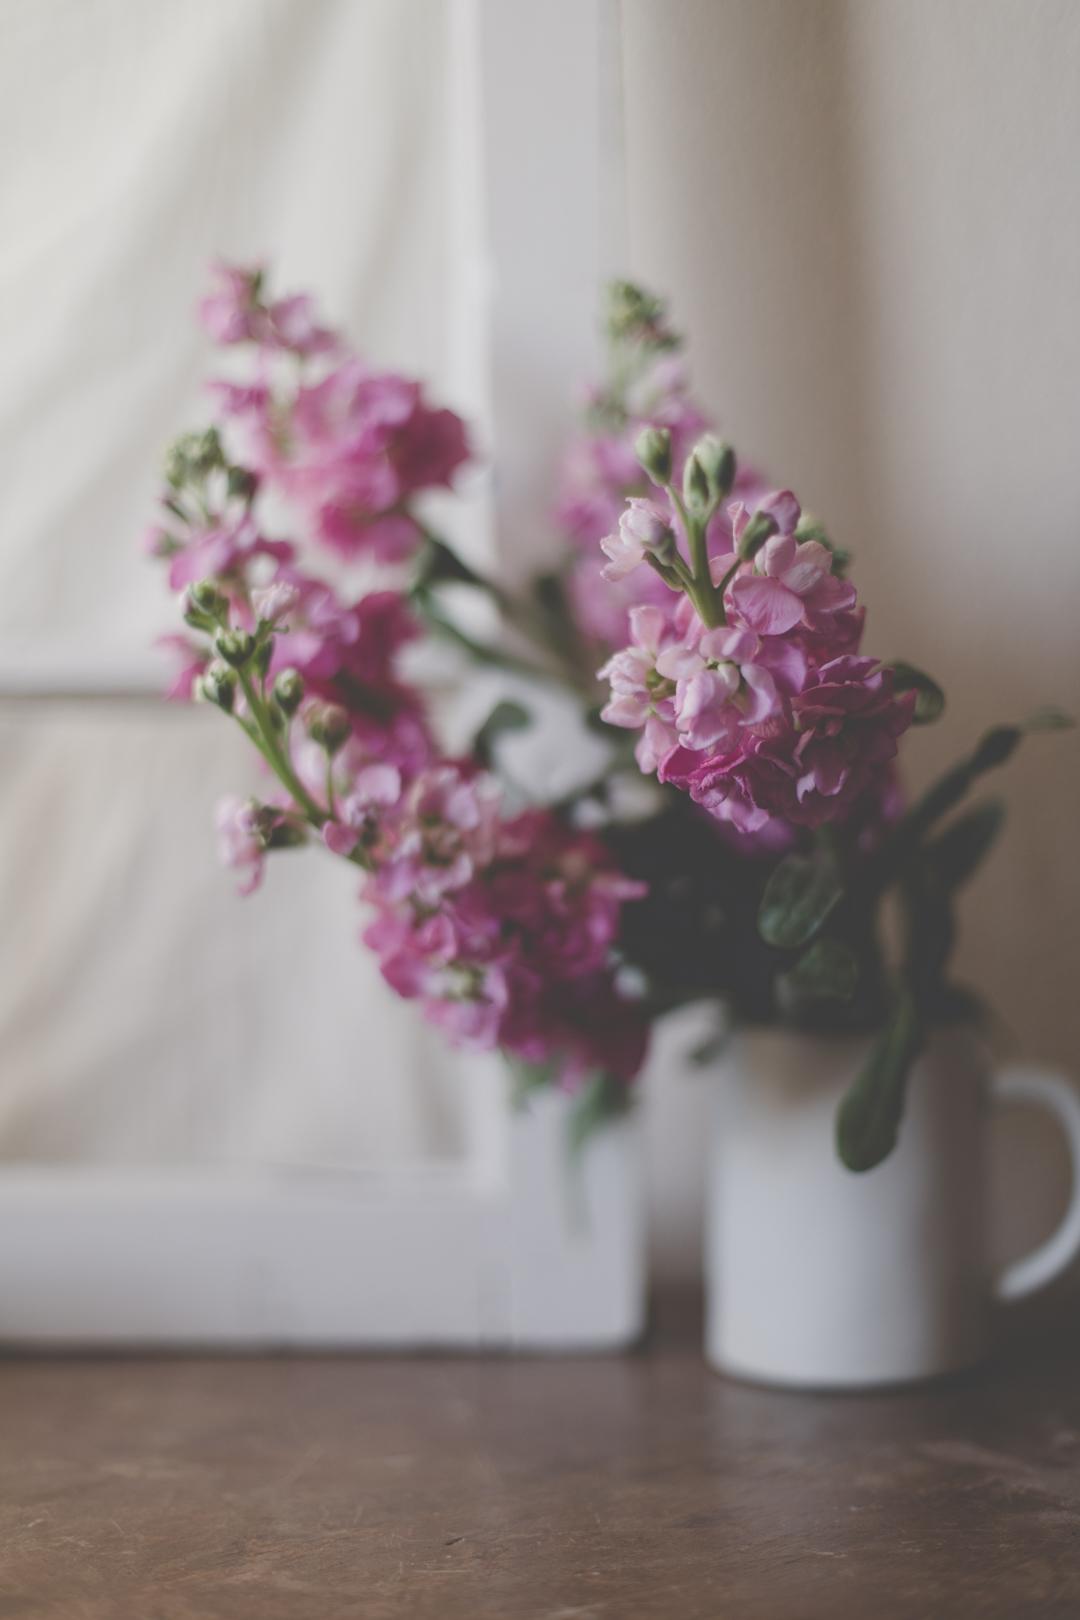 Pink Florals-9947-1